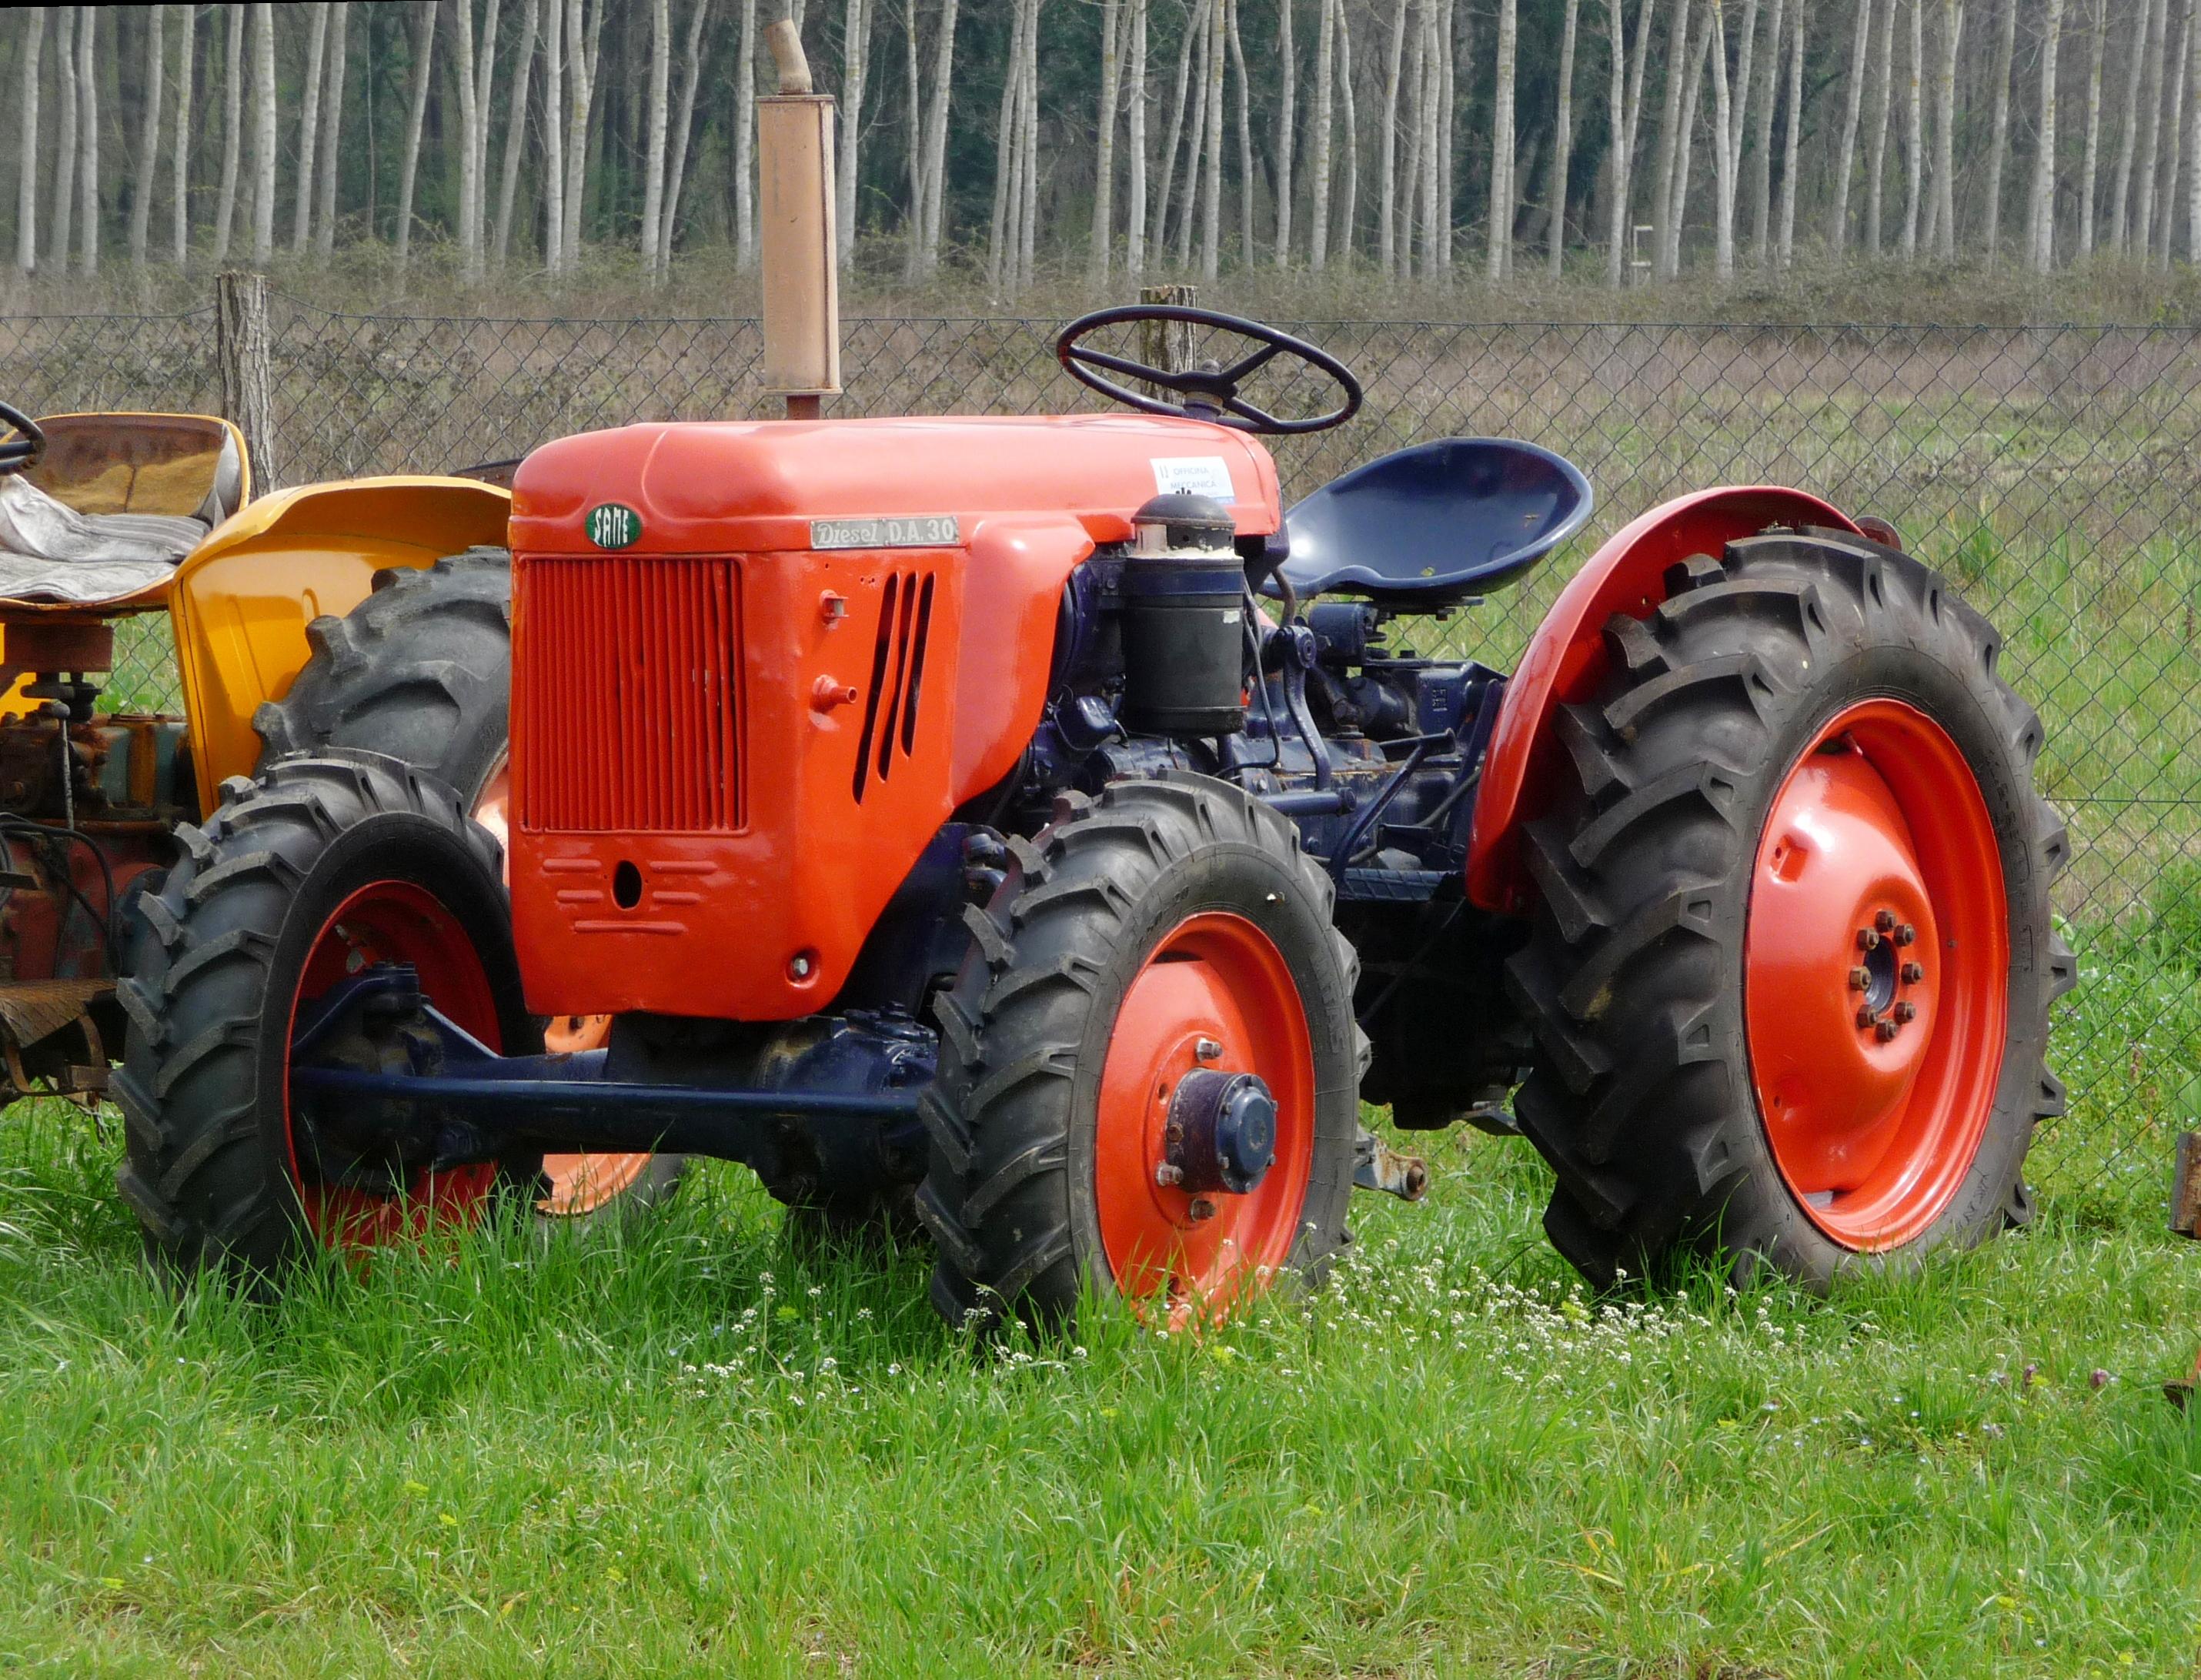 File:Same tractor 2.JPG - Wikimedia Commons